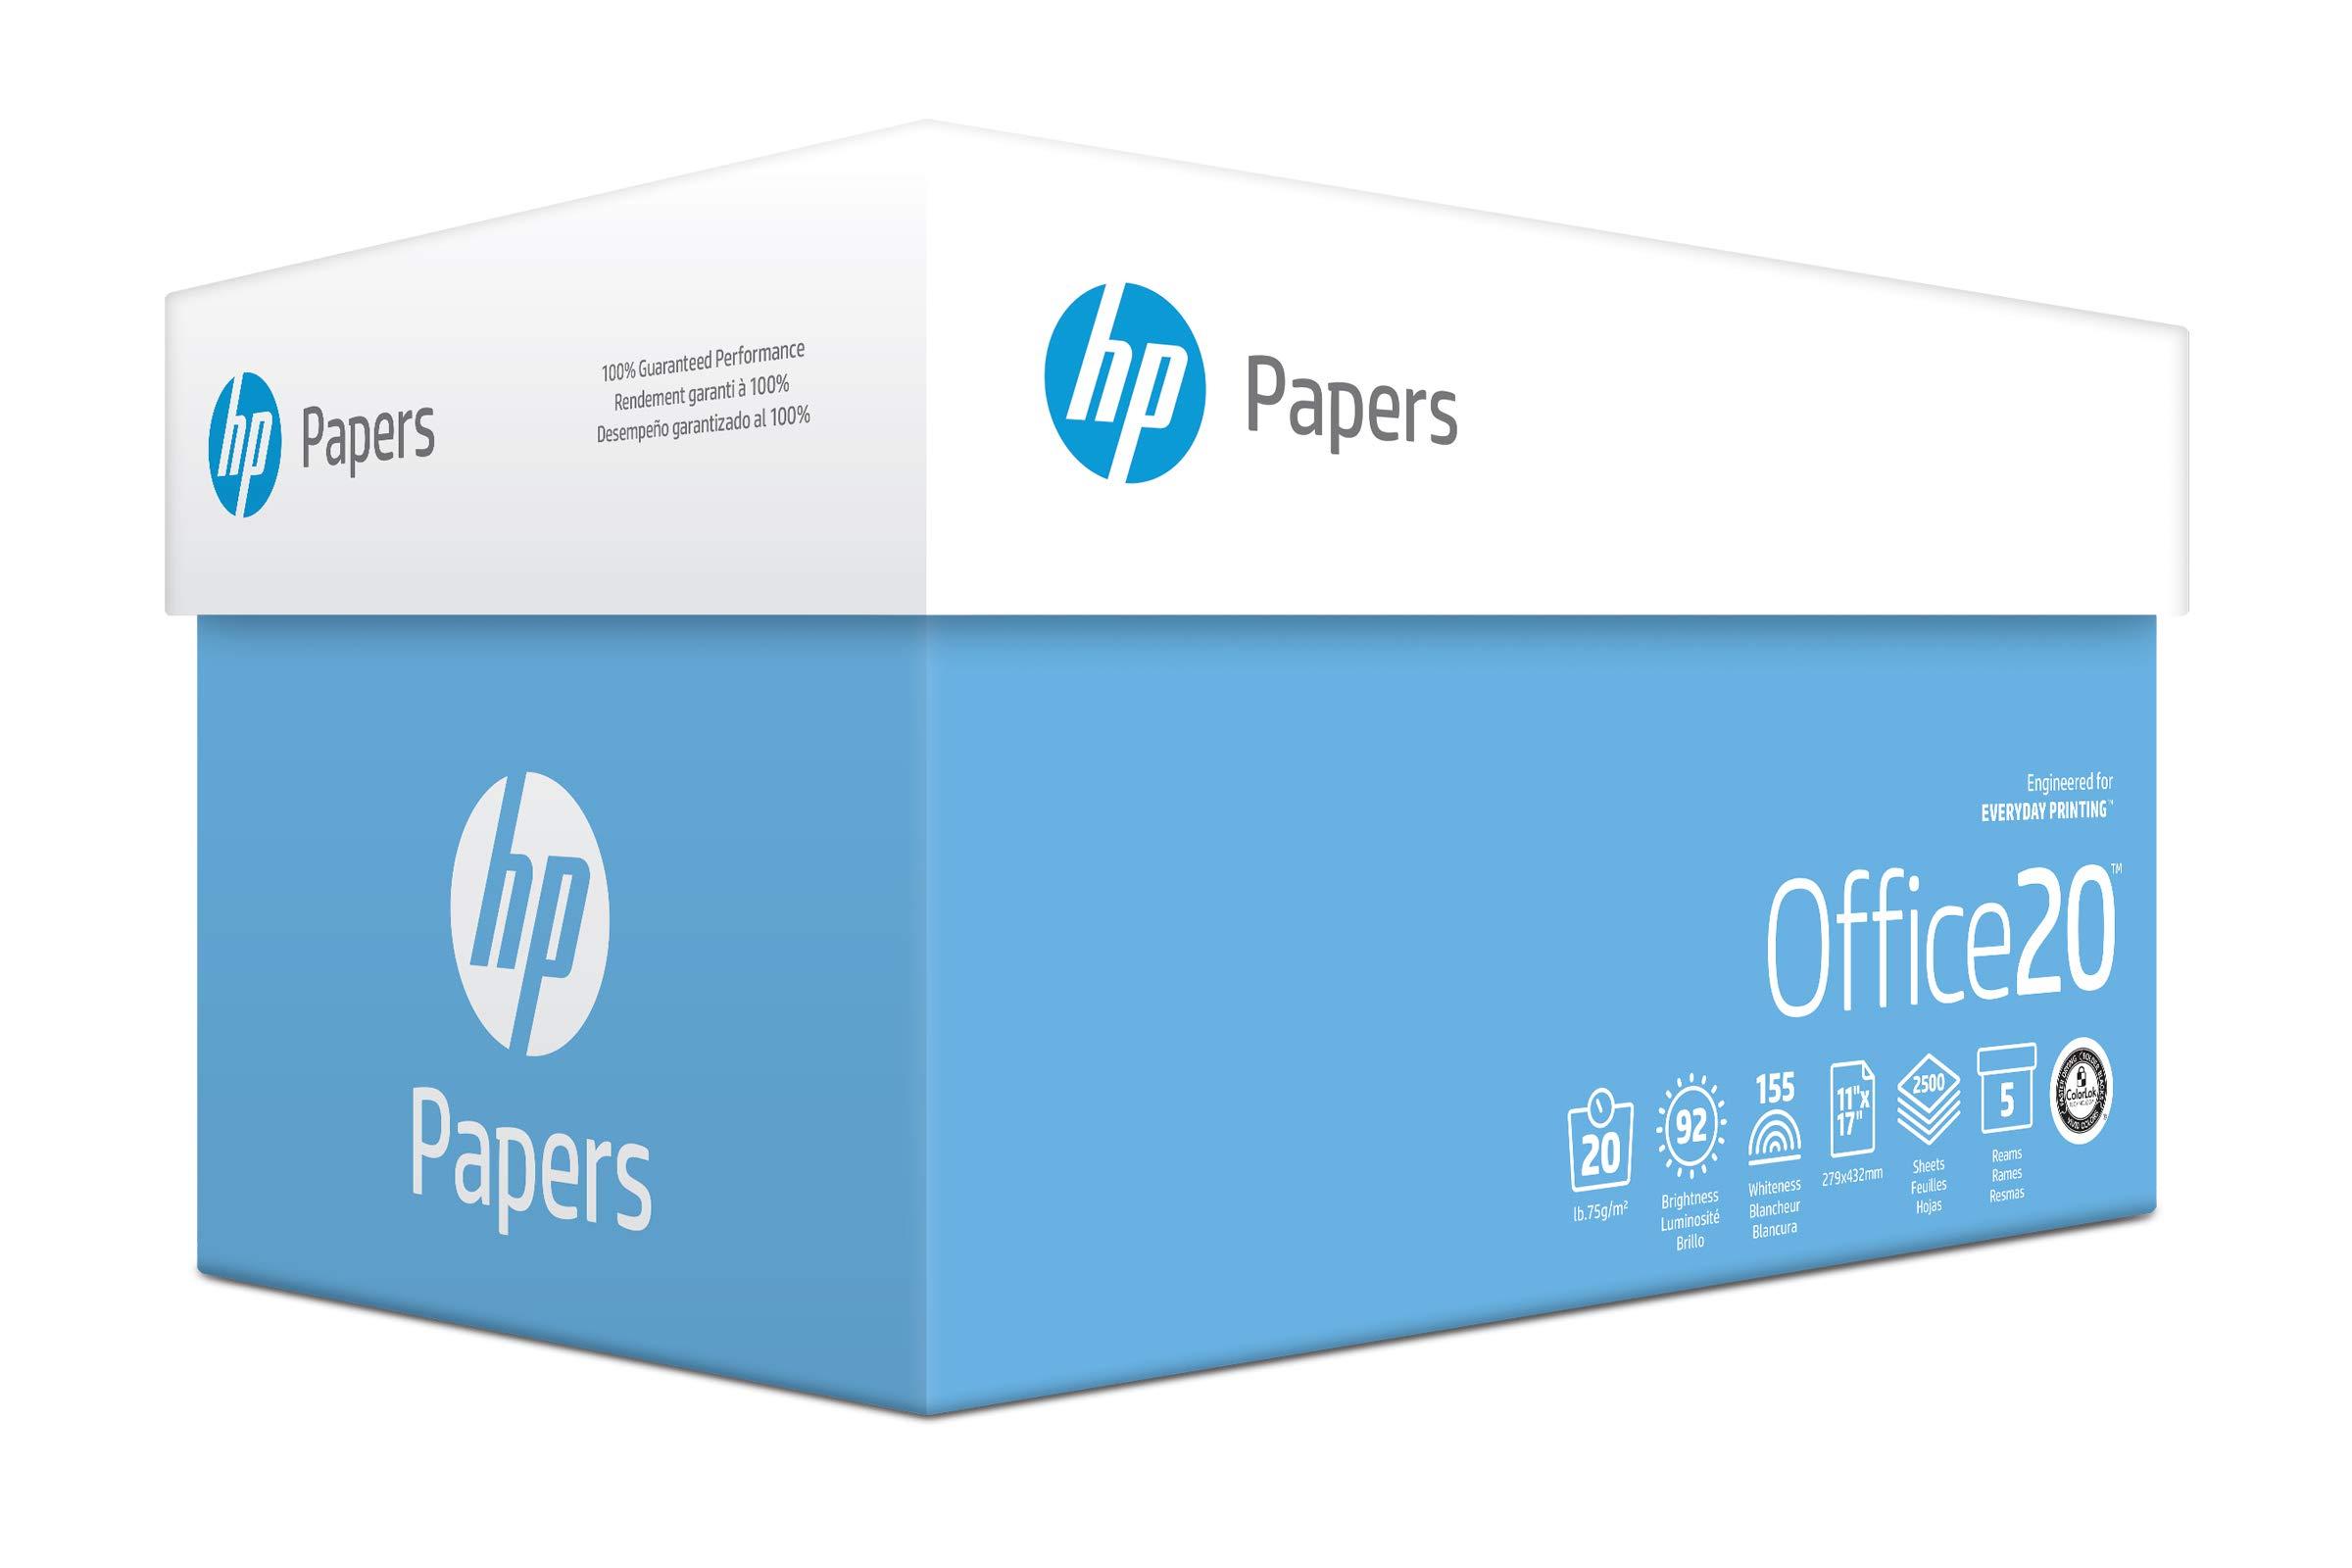 HP Printer Paper, Office20 Paper, 8.5 x 11 Paper, Letter Size, 20lb Paper, 92 Bright, 5 Ream Case / 2,500 Sheets (172160C) Acid Free Paper